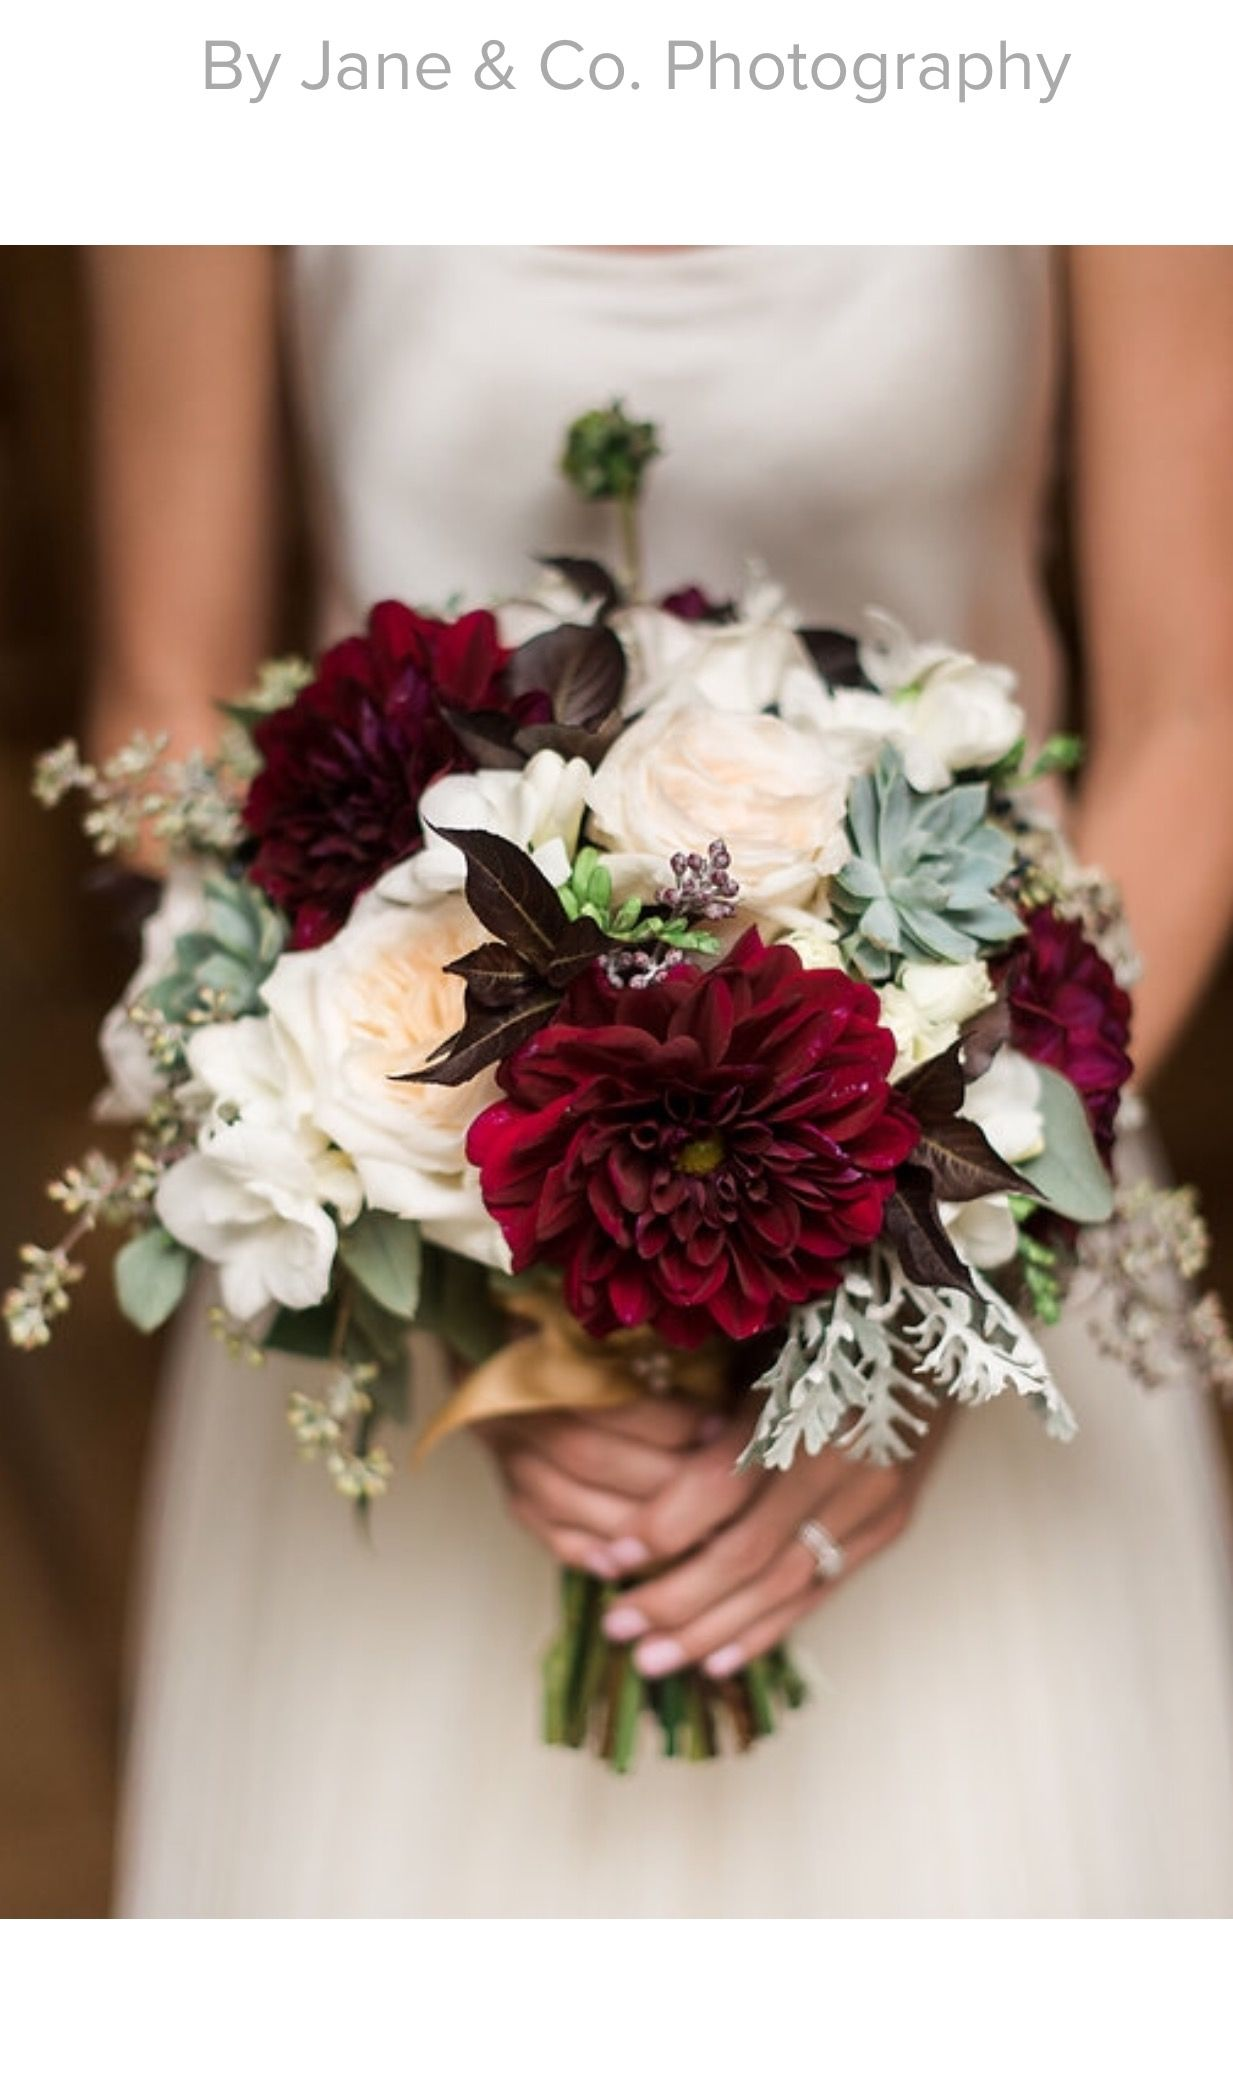 Early fall bridal bouquet Blush, maroon, grey Garden roses